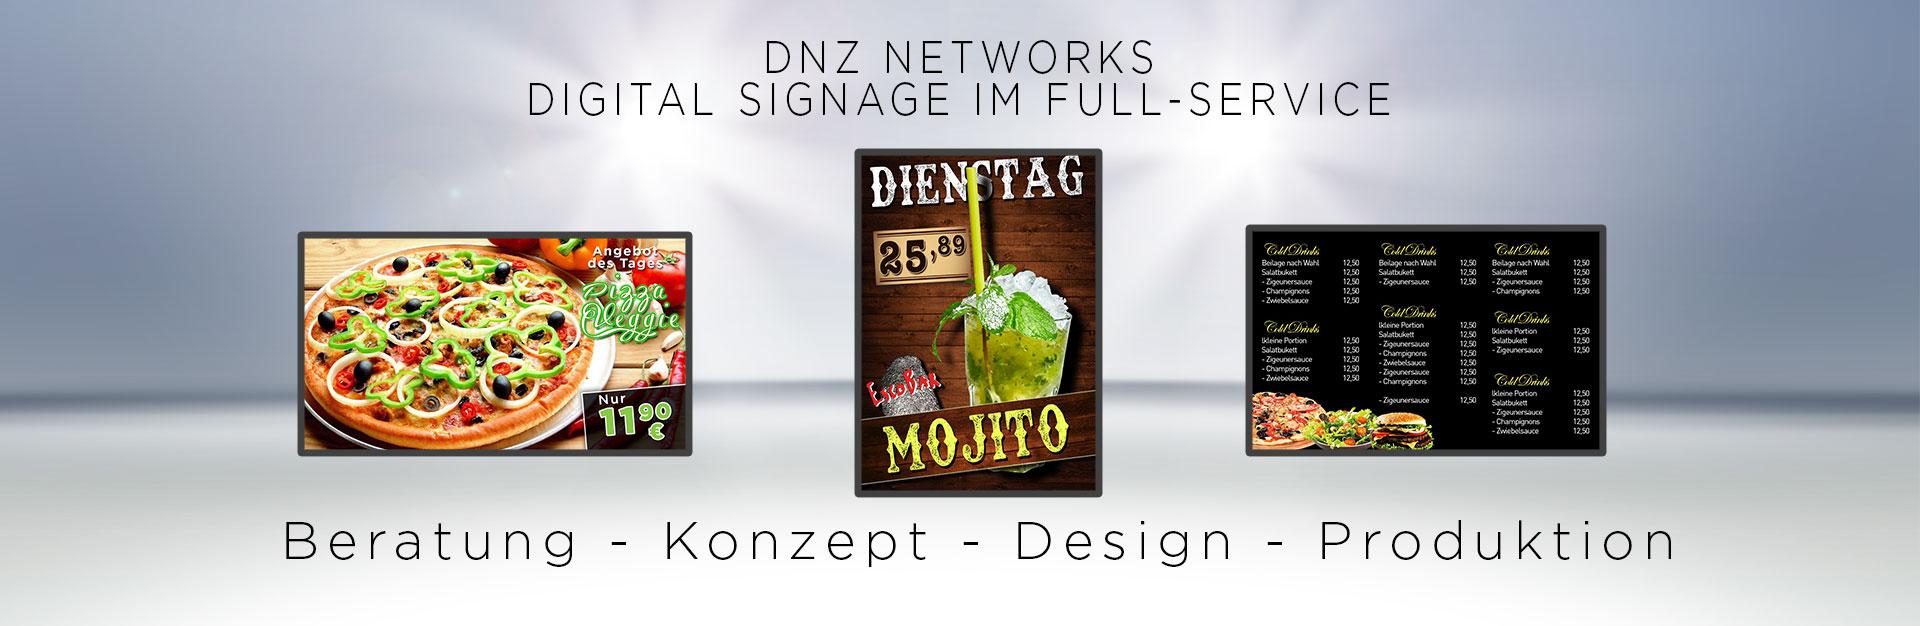 Digital Signage Full-Service Produtkion Menukarte Beratung Design Branche-Gastronomie - DNZ-Networks